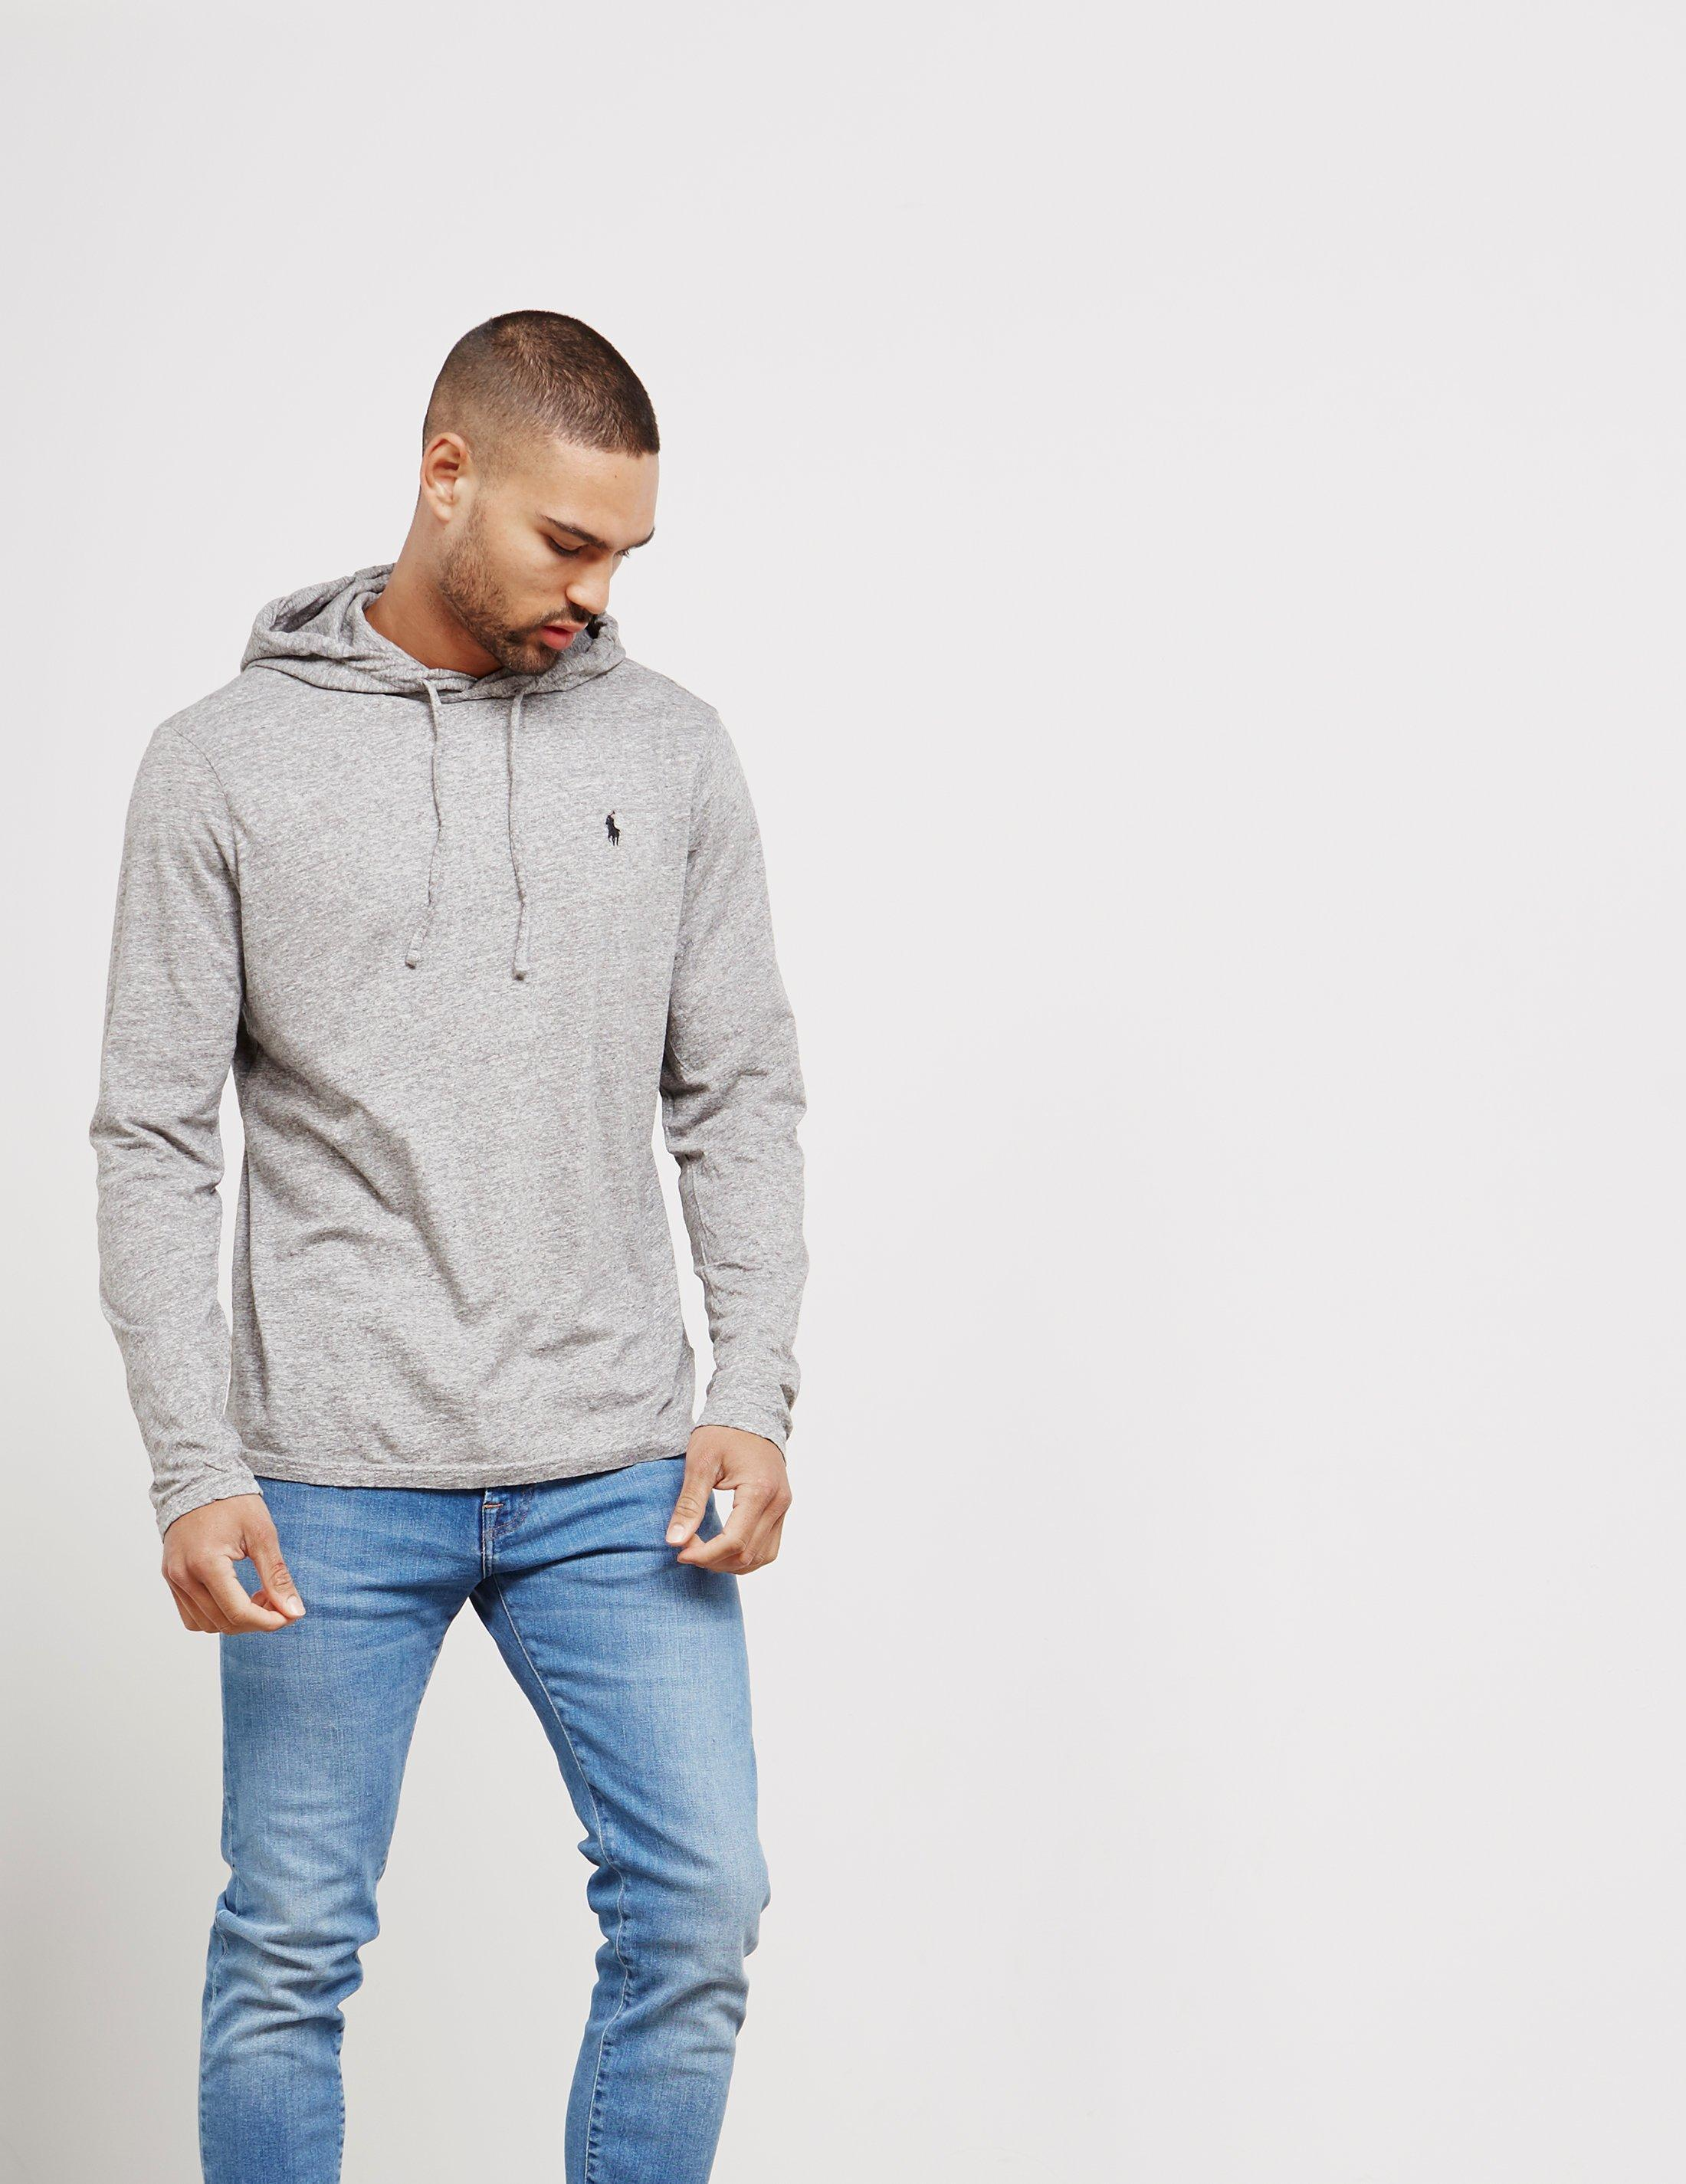 Men Cotton Shirt Lauren Gray Jersey Ralph Polo Hooded For T BoWdrexC